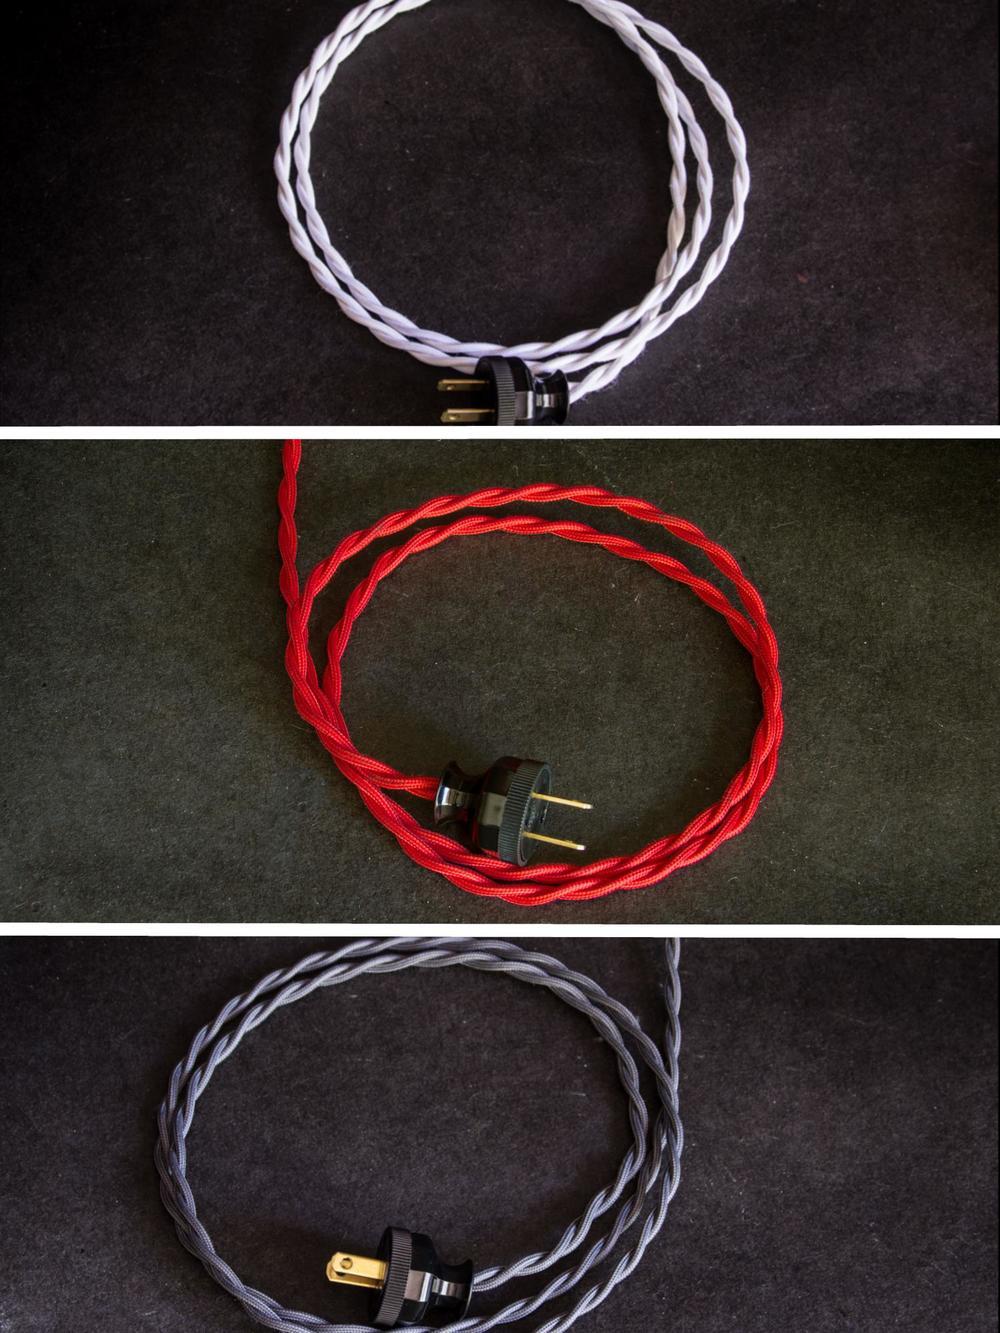 3 Plugs Colored.jpg